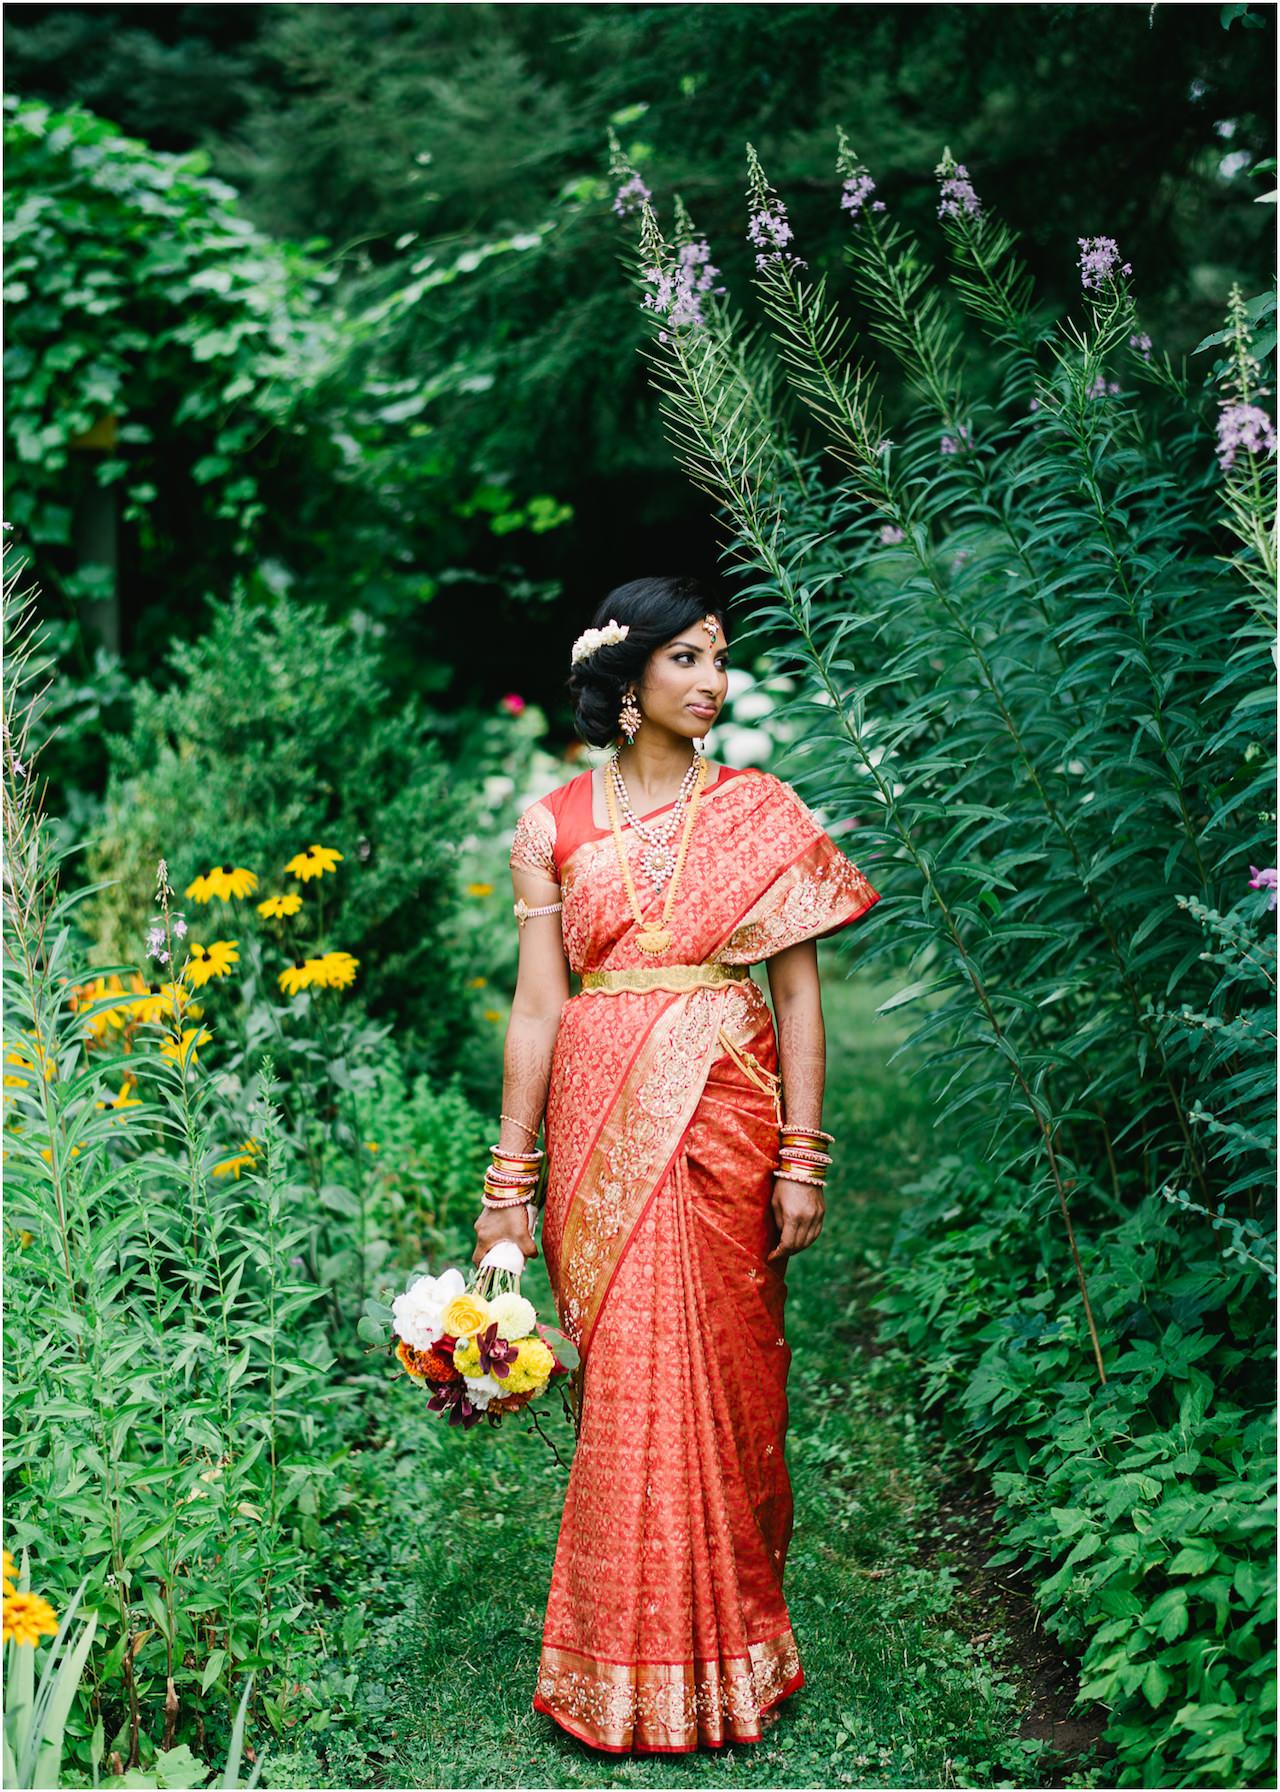 mt-hood-organic-farms-indian-wedding-065a.jpg